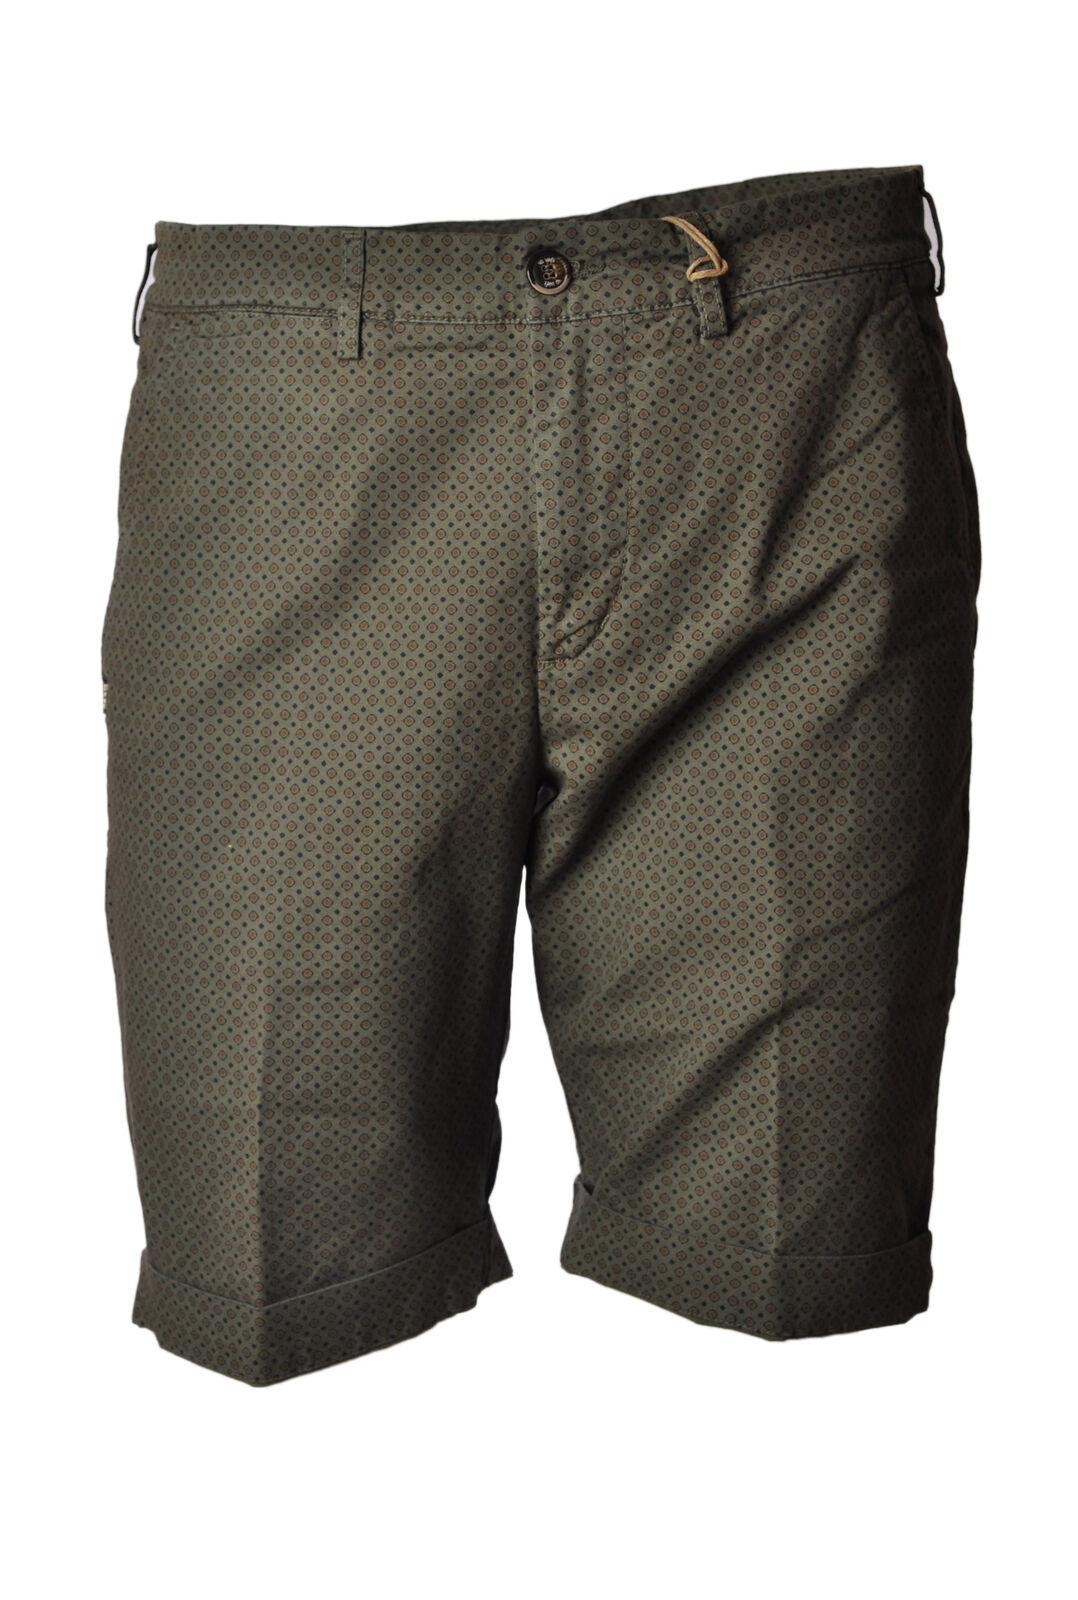 40 Weft - Pantaloni-Bermuda - Uomo - verde verde verde - 5135710H181104 0d0607